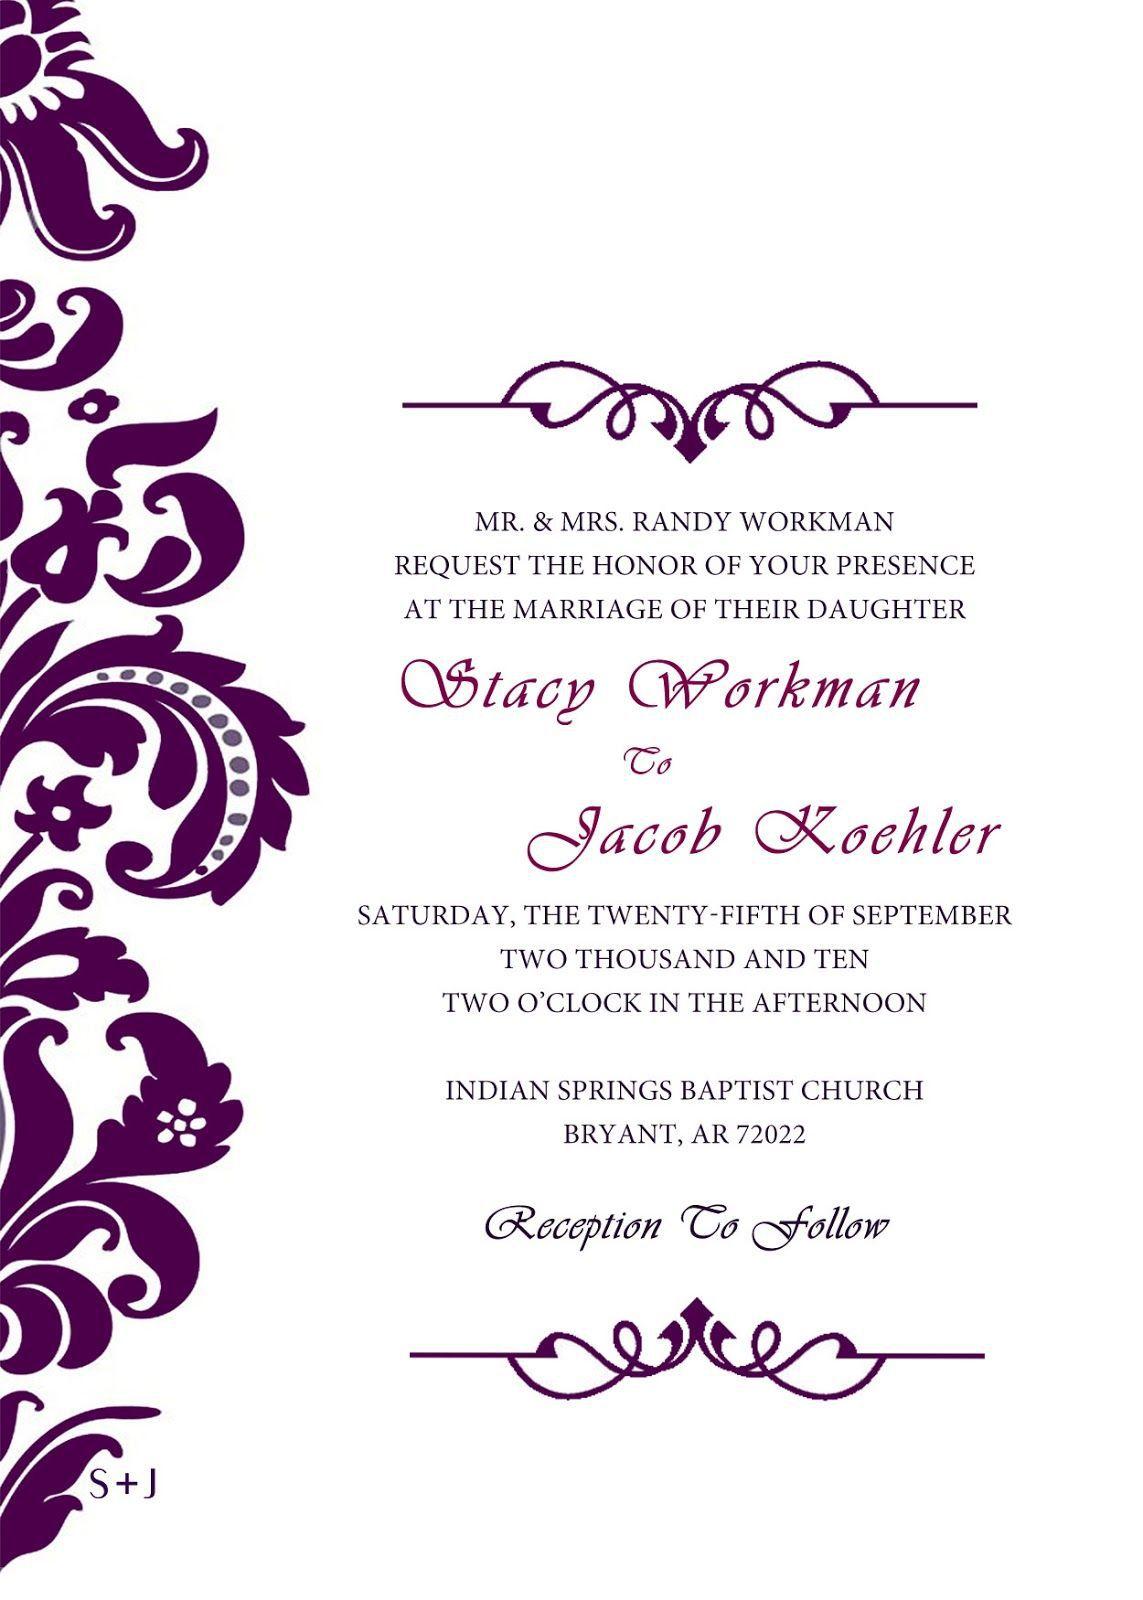 002 Dreaded Formal Wedding Invitation Template Free Highest Clarity Full